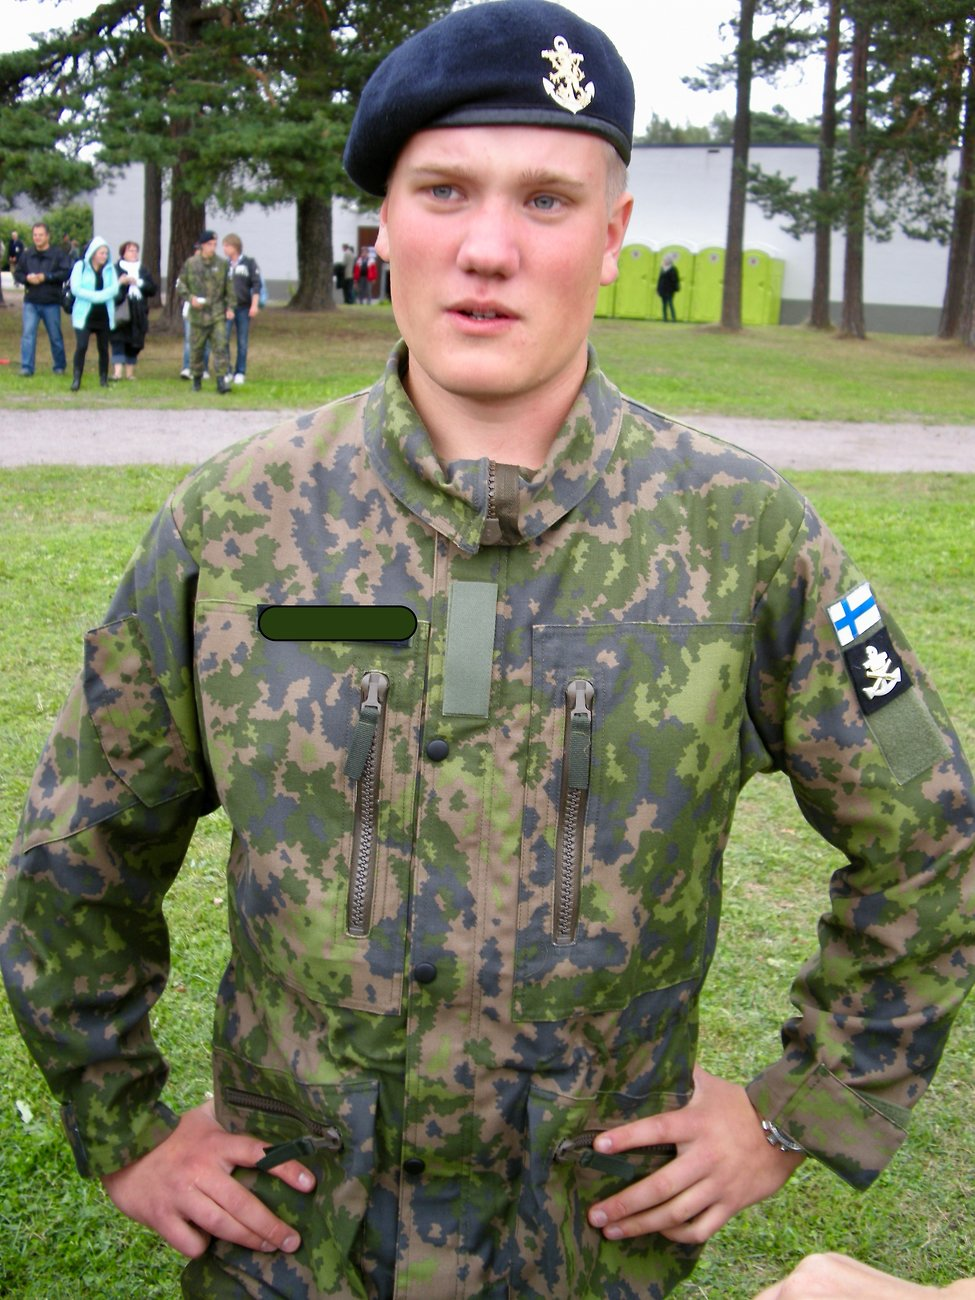 Sotilasvala Mikael Upinniemi 2010-08-27 12.19.39 COOLPIX S700 f2.8 1_64s ISO0.jpeg